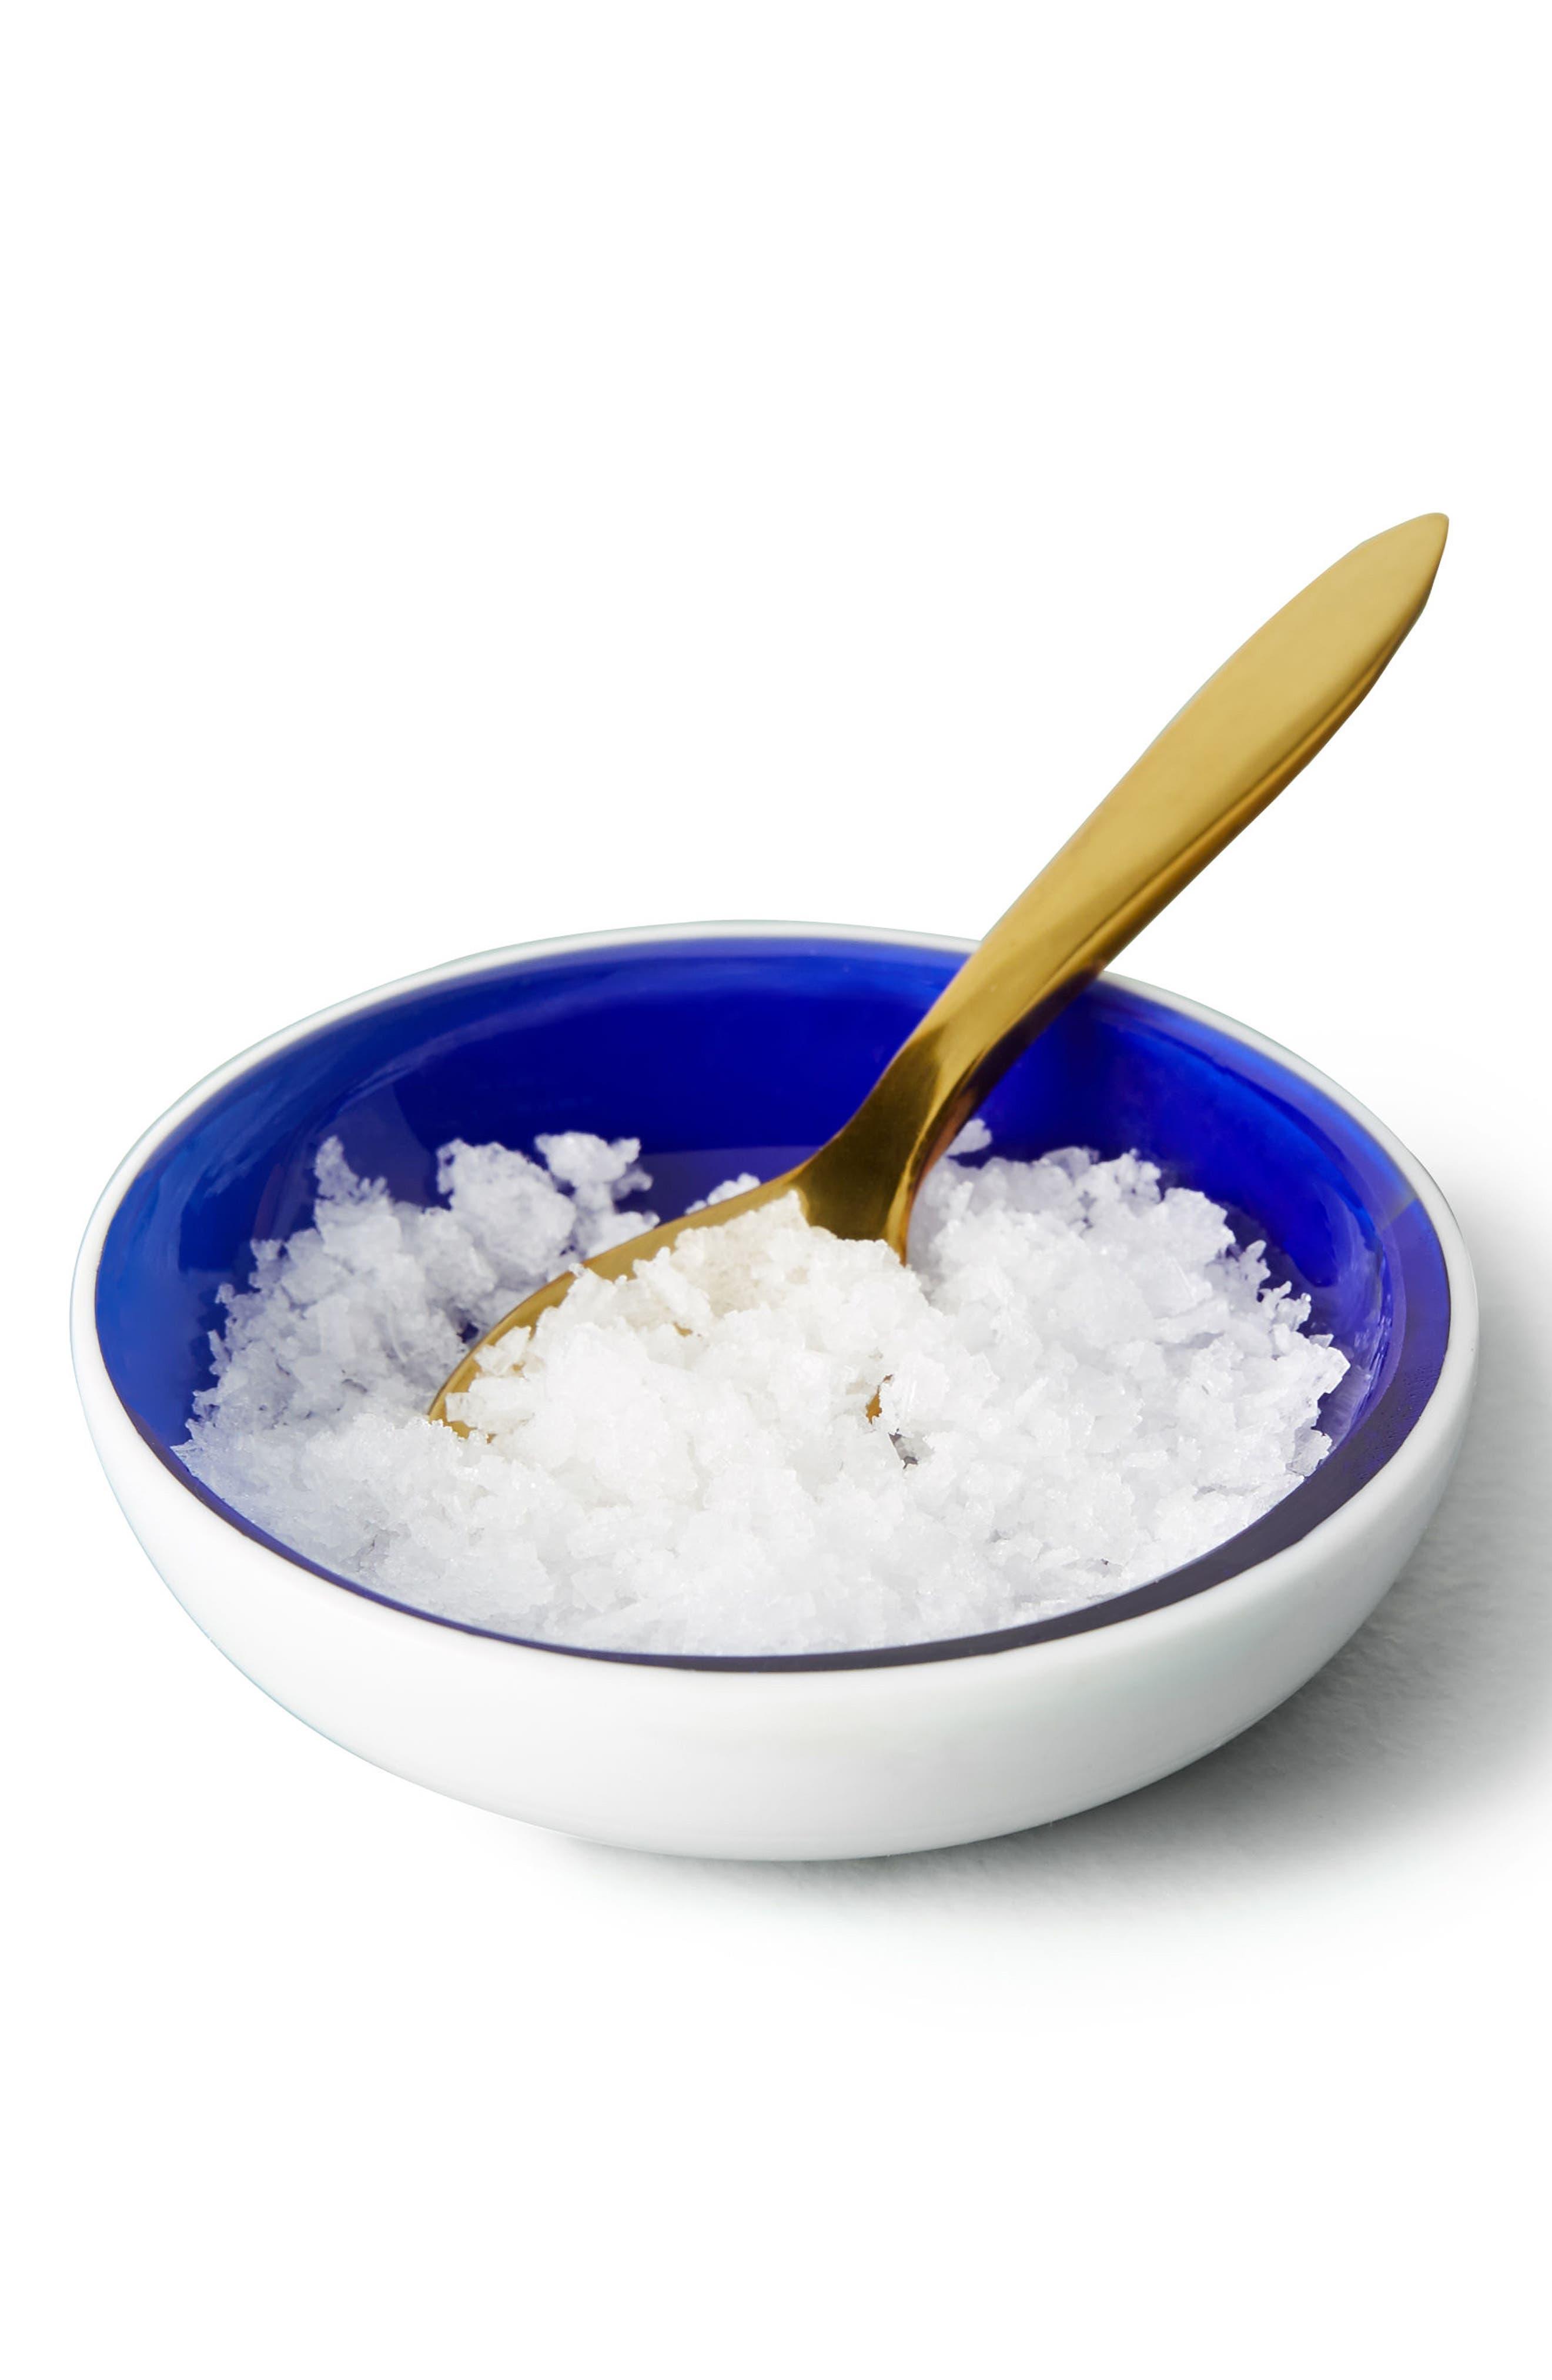 Luray Salt Cellar & Spoon Set,                             Alternate thumbnail 4, color,                             Blue